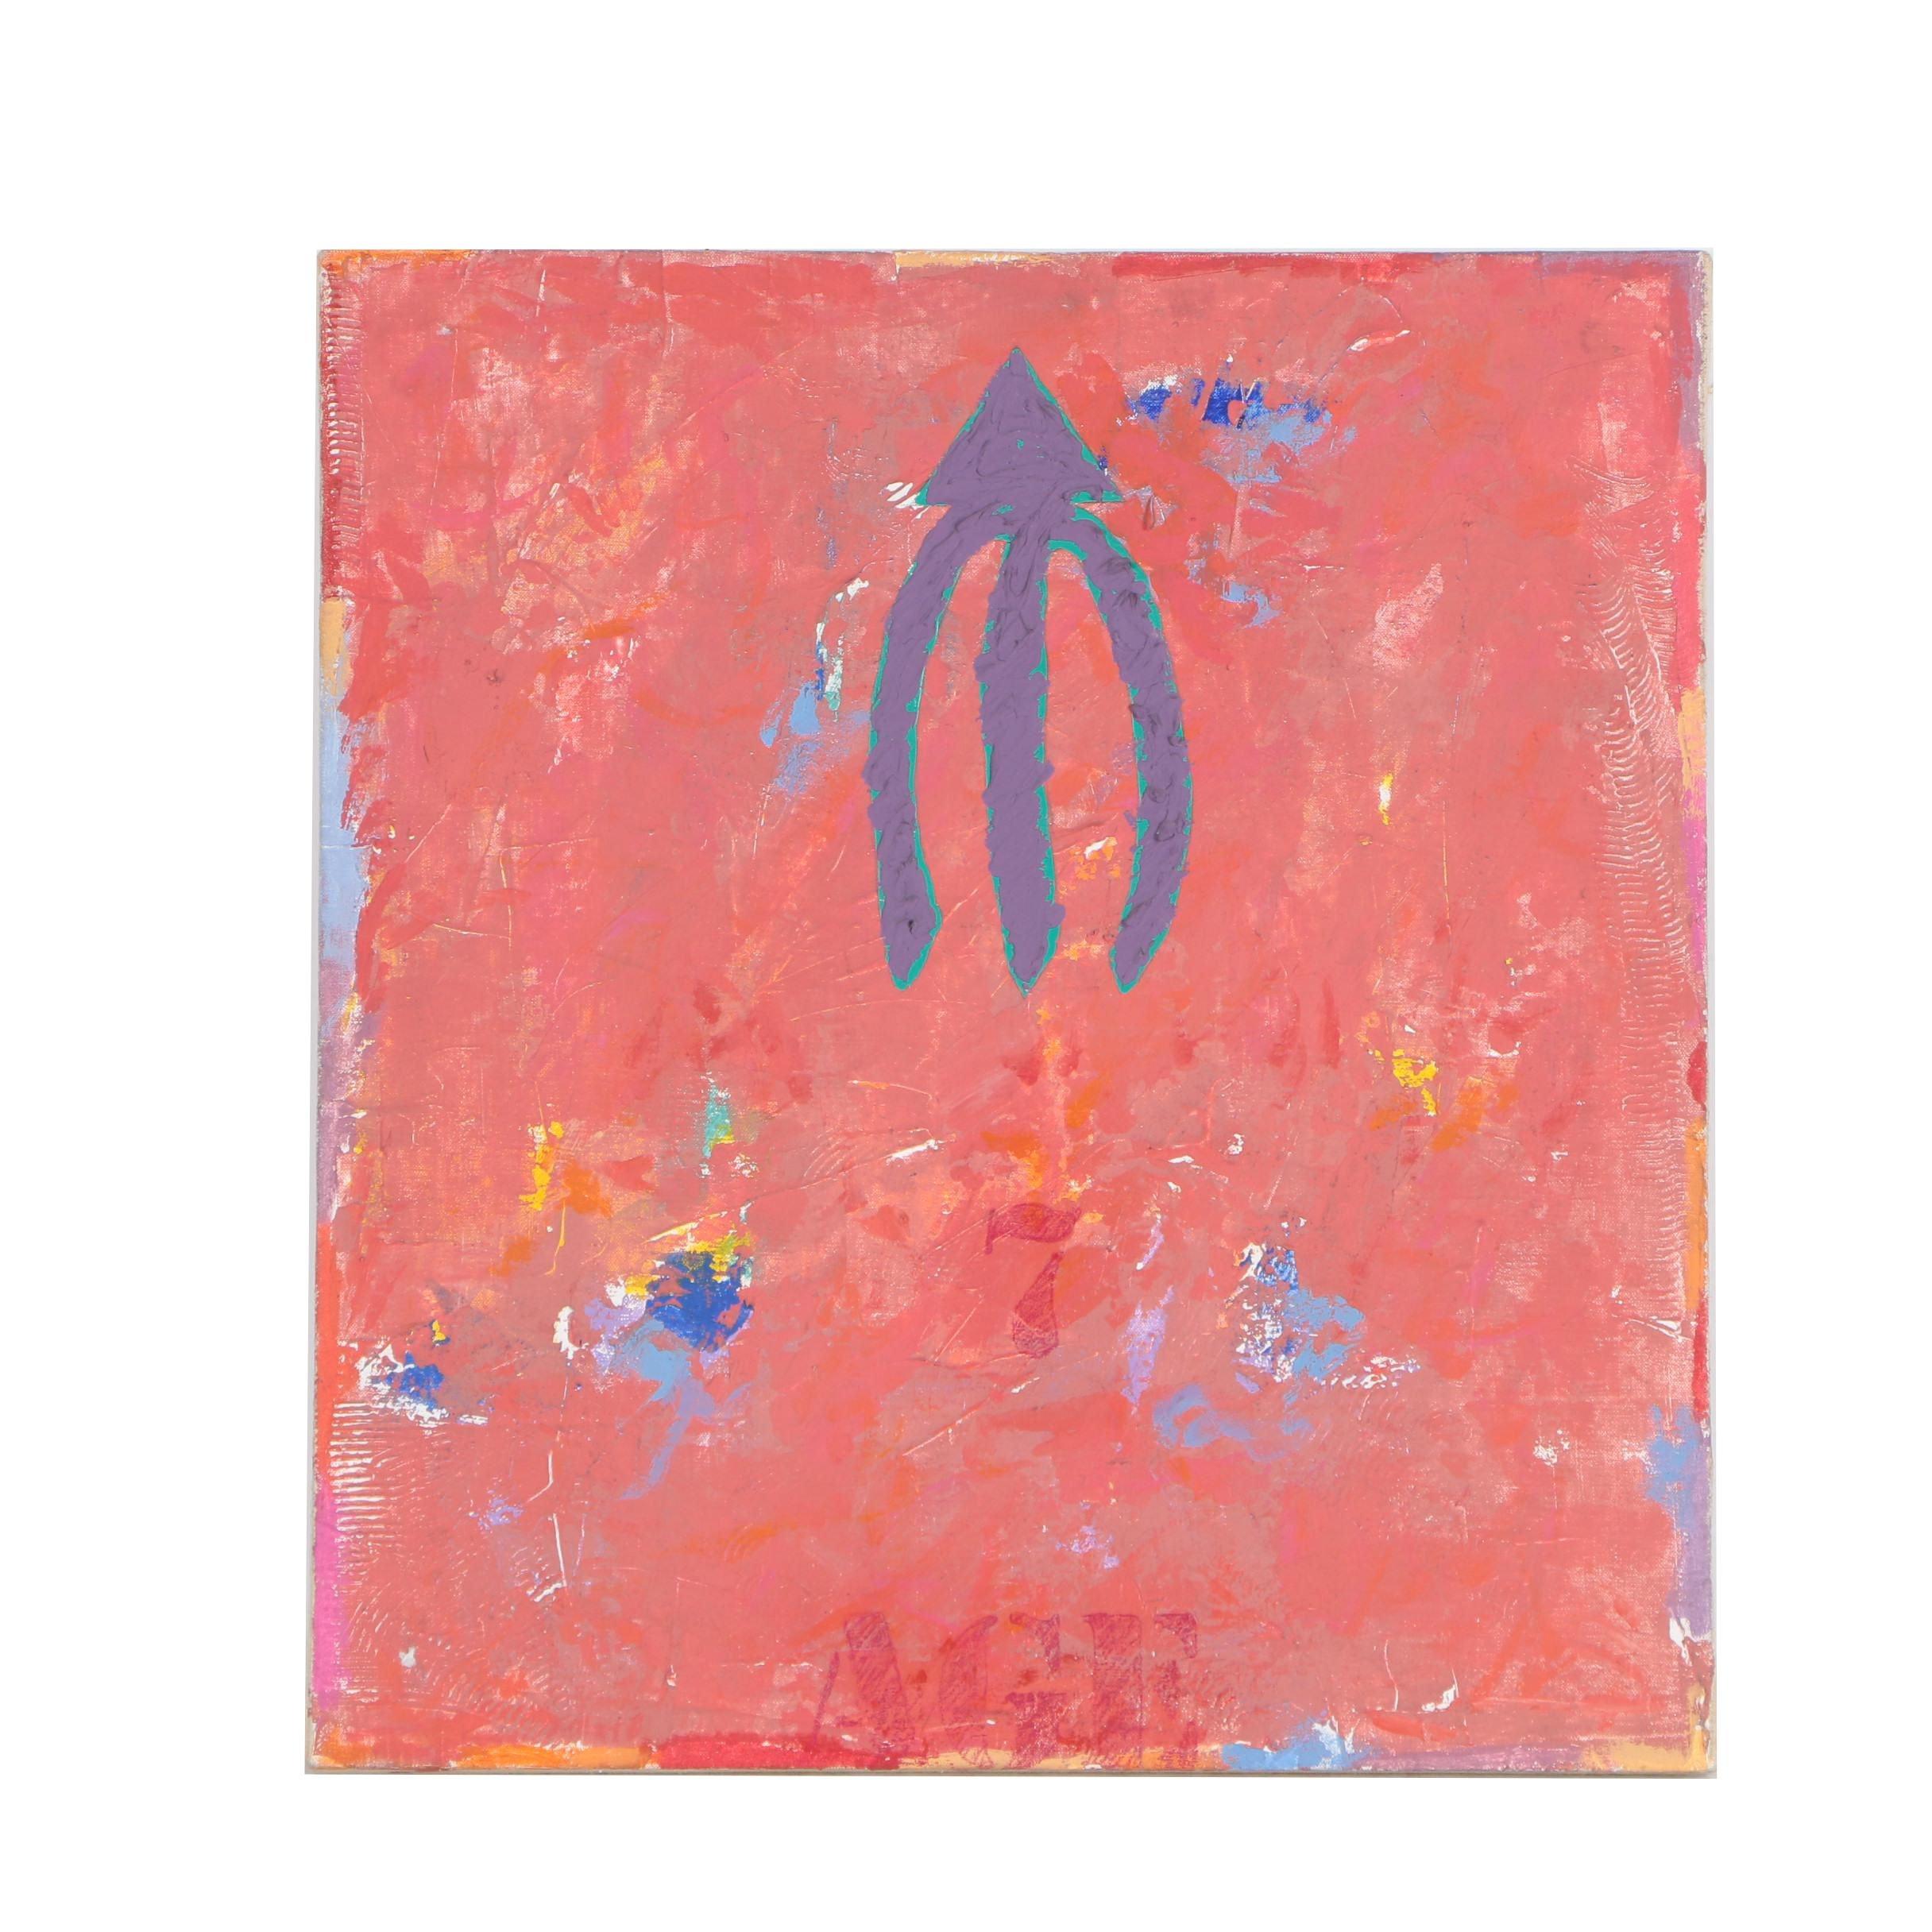 "John Rozelle 1989 Mixed Media Painting ""Passage Series #12"""